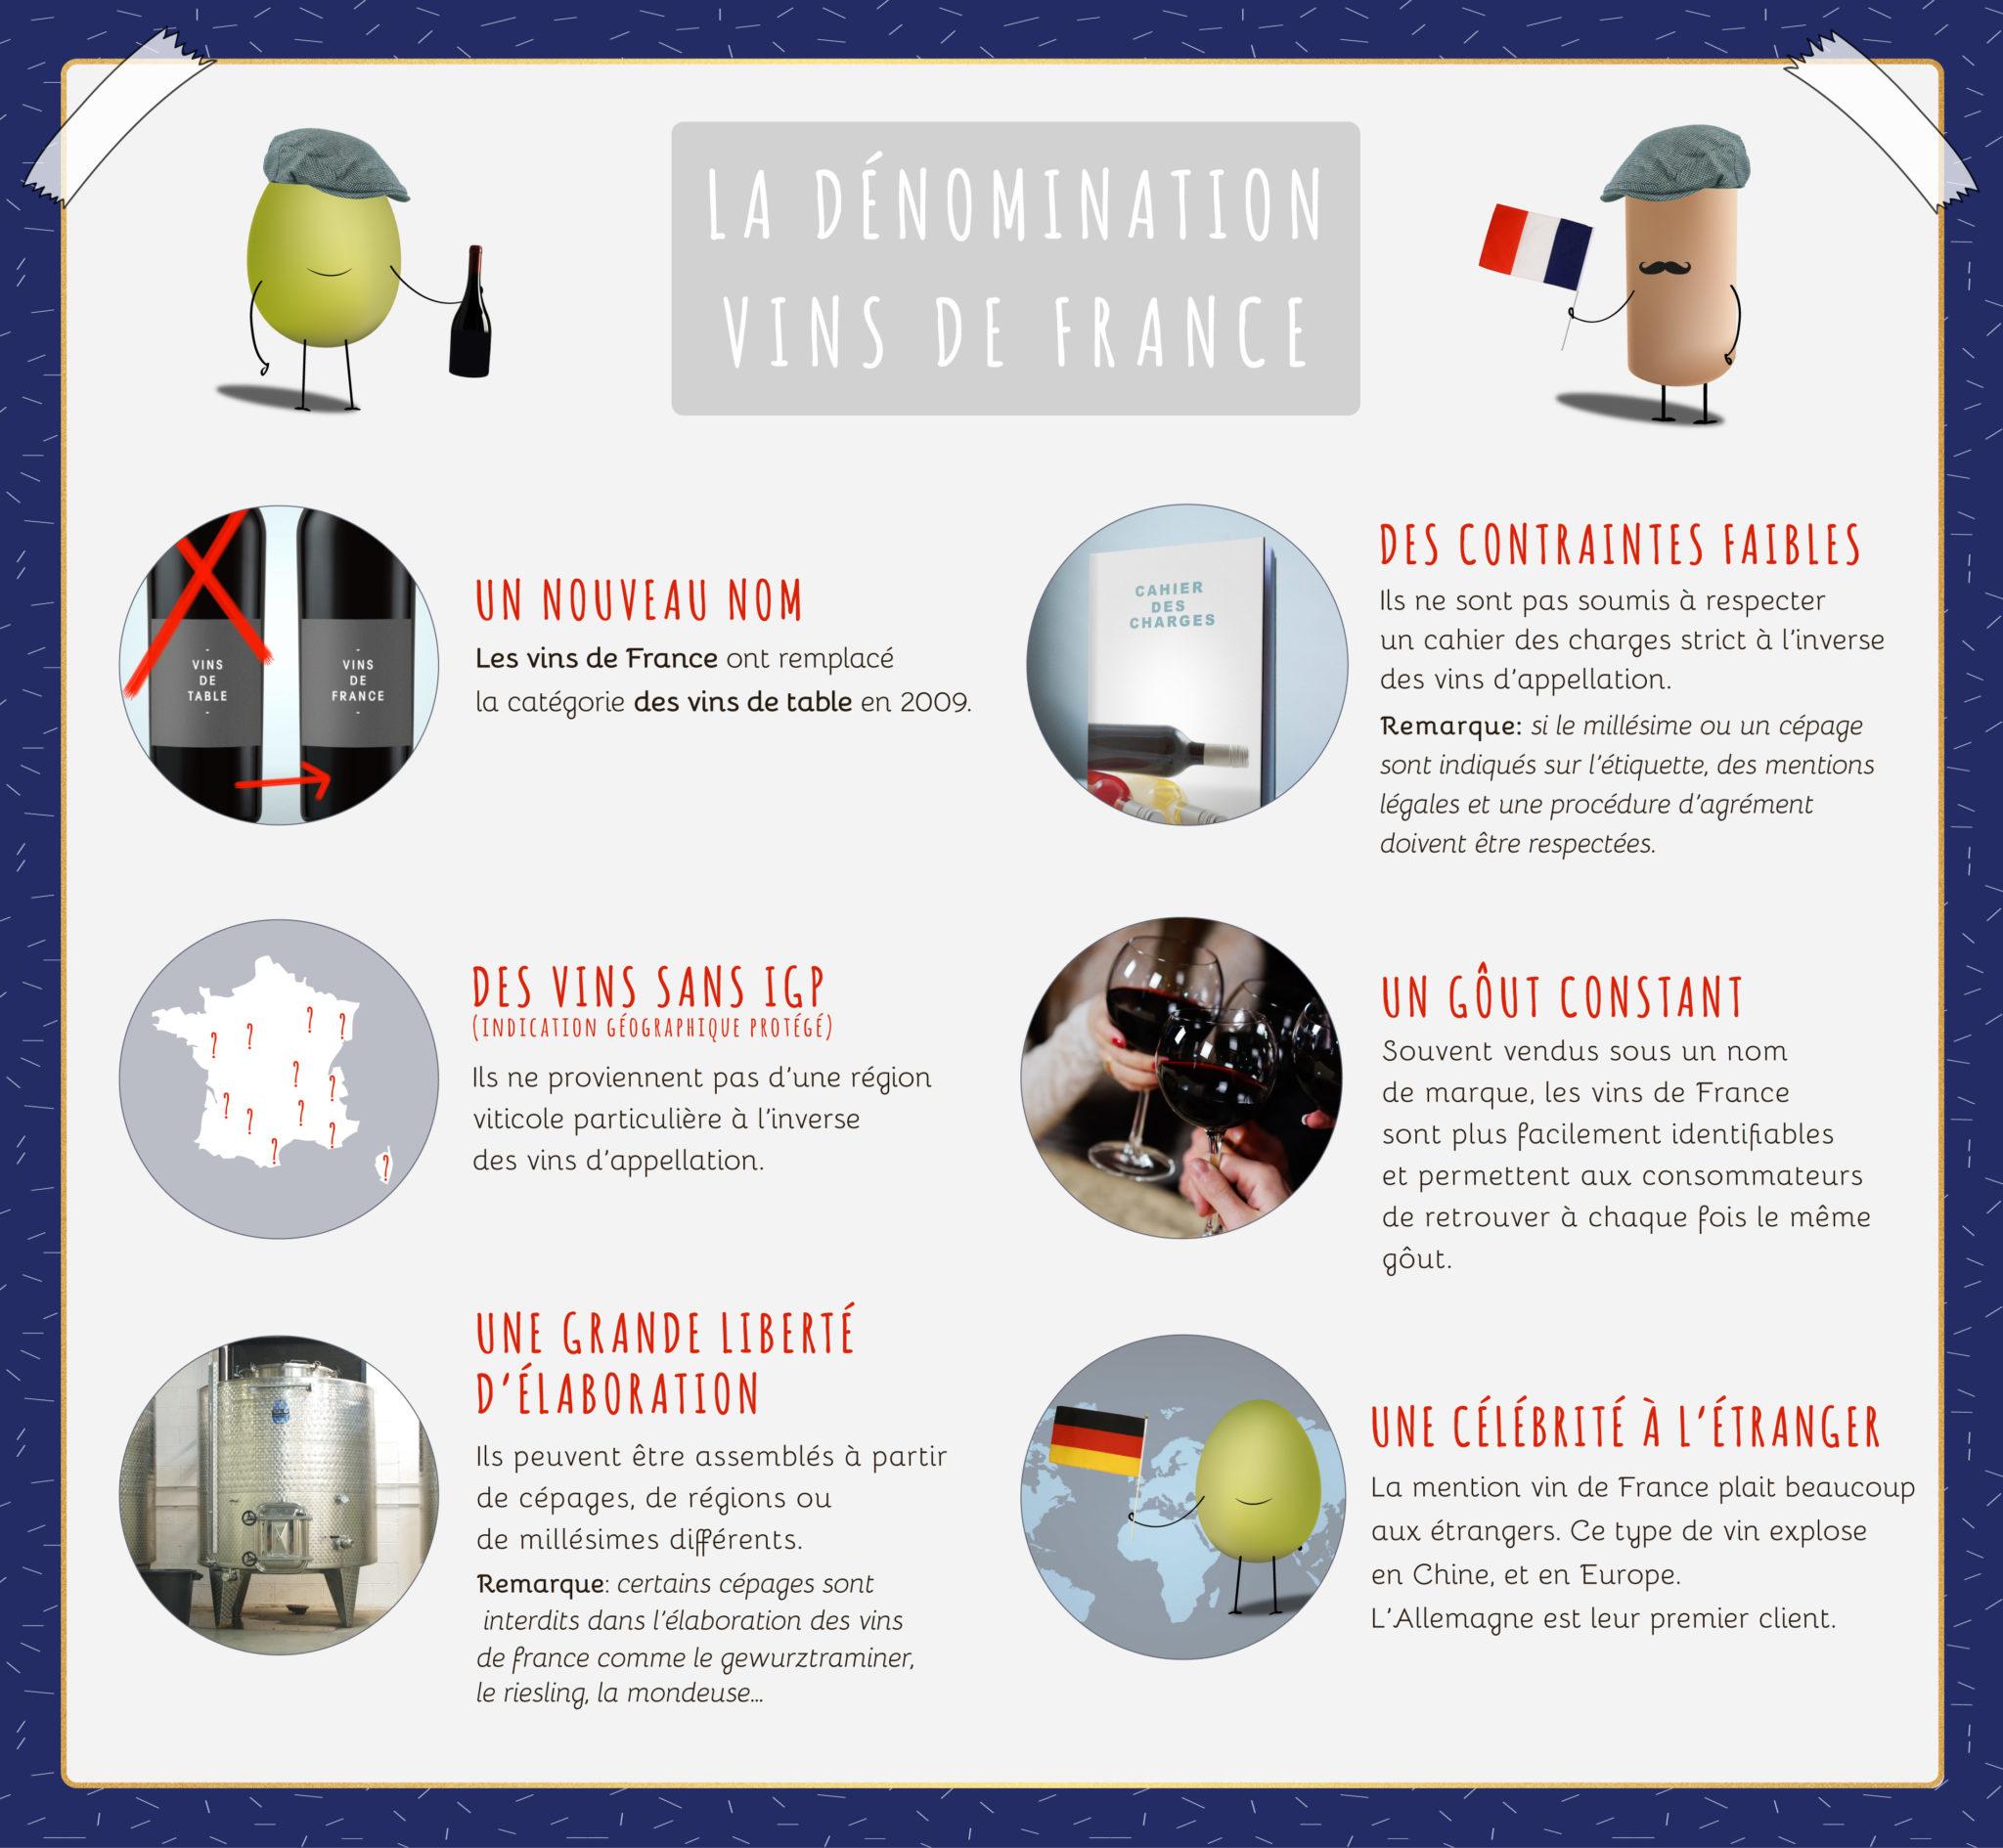 vins-de-france-02-01